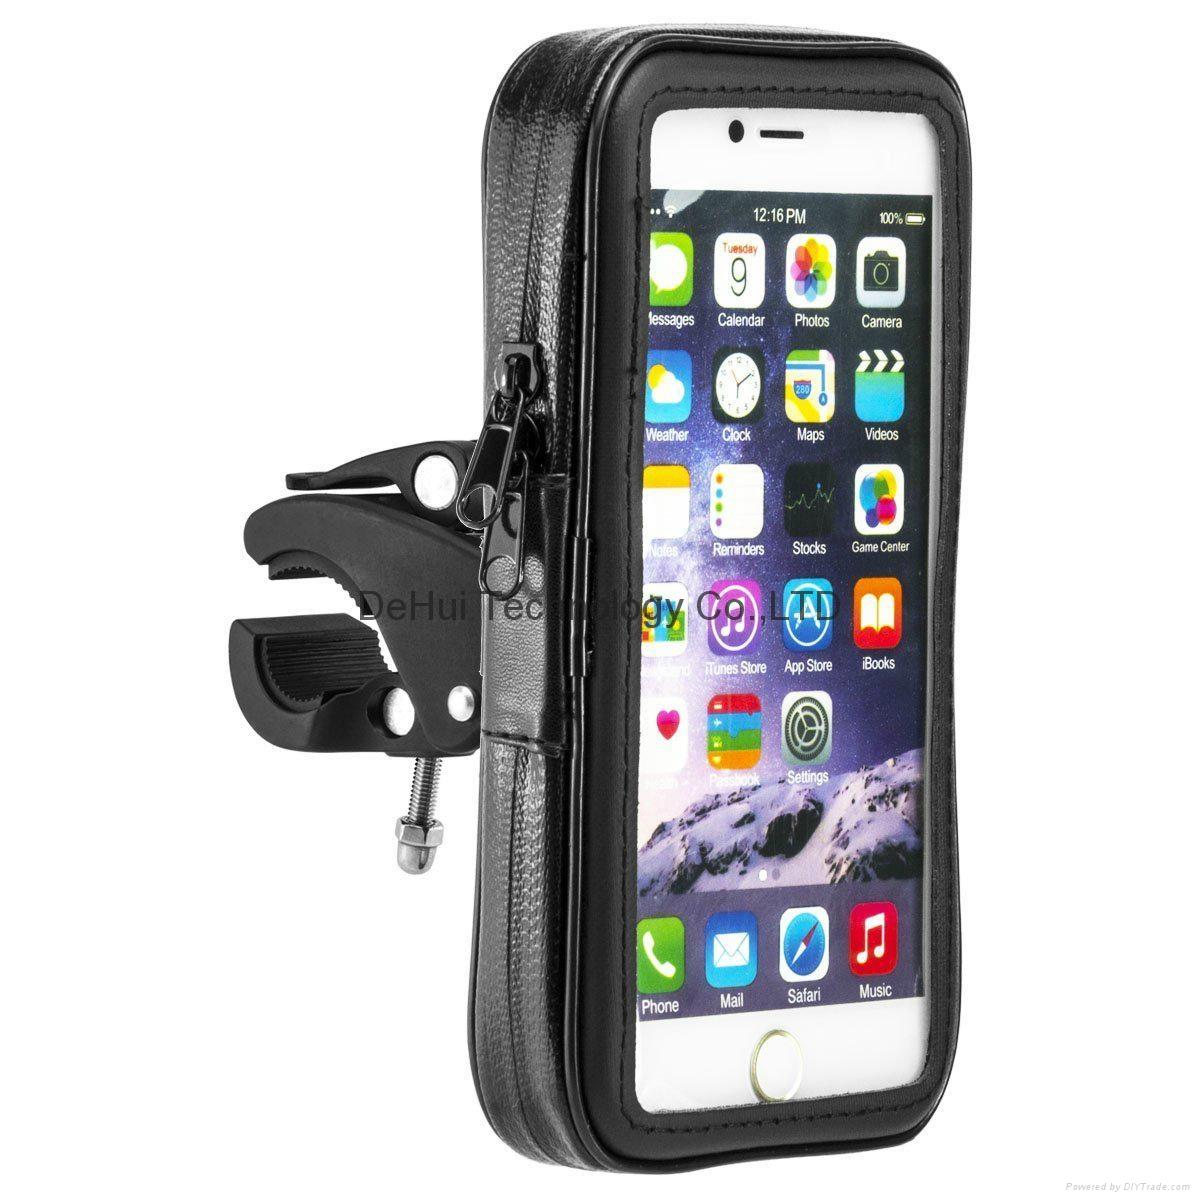 Waterproof bag bike mount for iphone 6 Plus 5.5inch